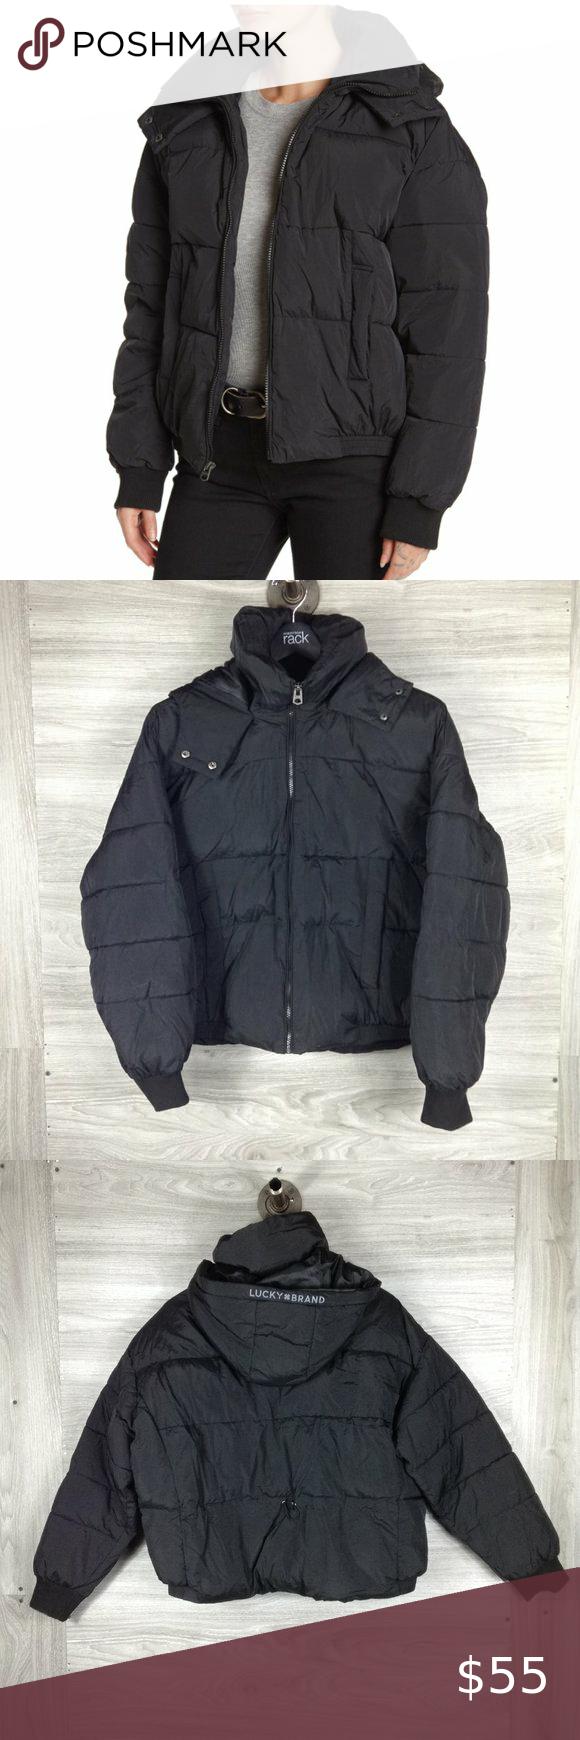 Lucky Brand Black Missy Short Puffer Jacket Short Puffer Jacket Puffer Jackets Lucky Brand [ 1740 x 580 Pixel ]